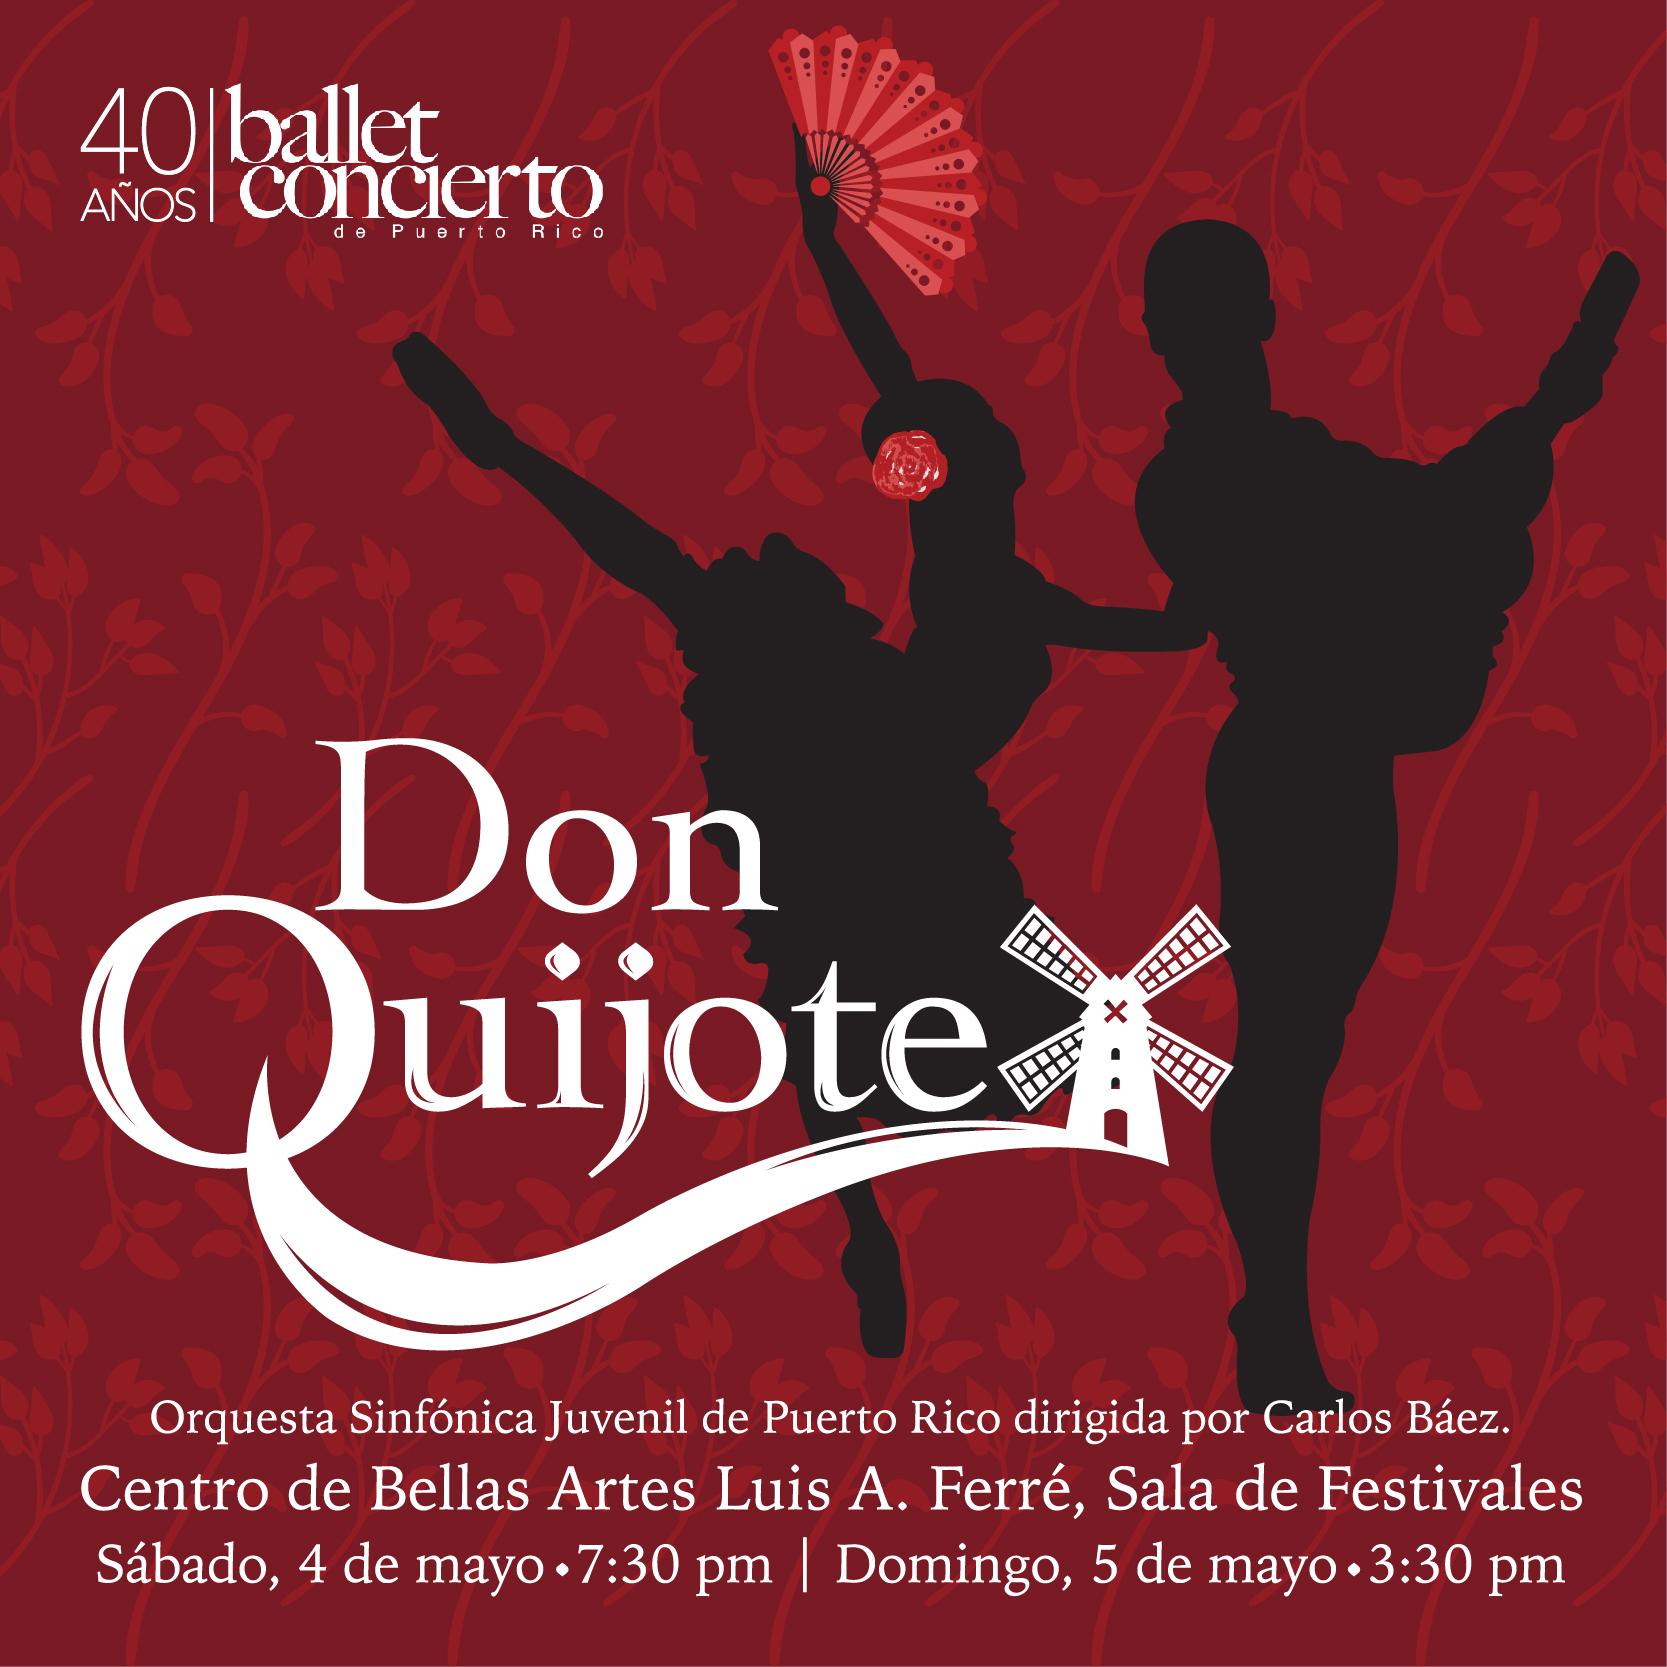 Don-Quijote_FB-Promo_400x400.jpg